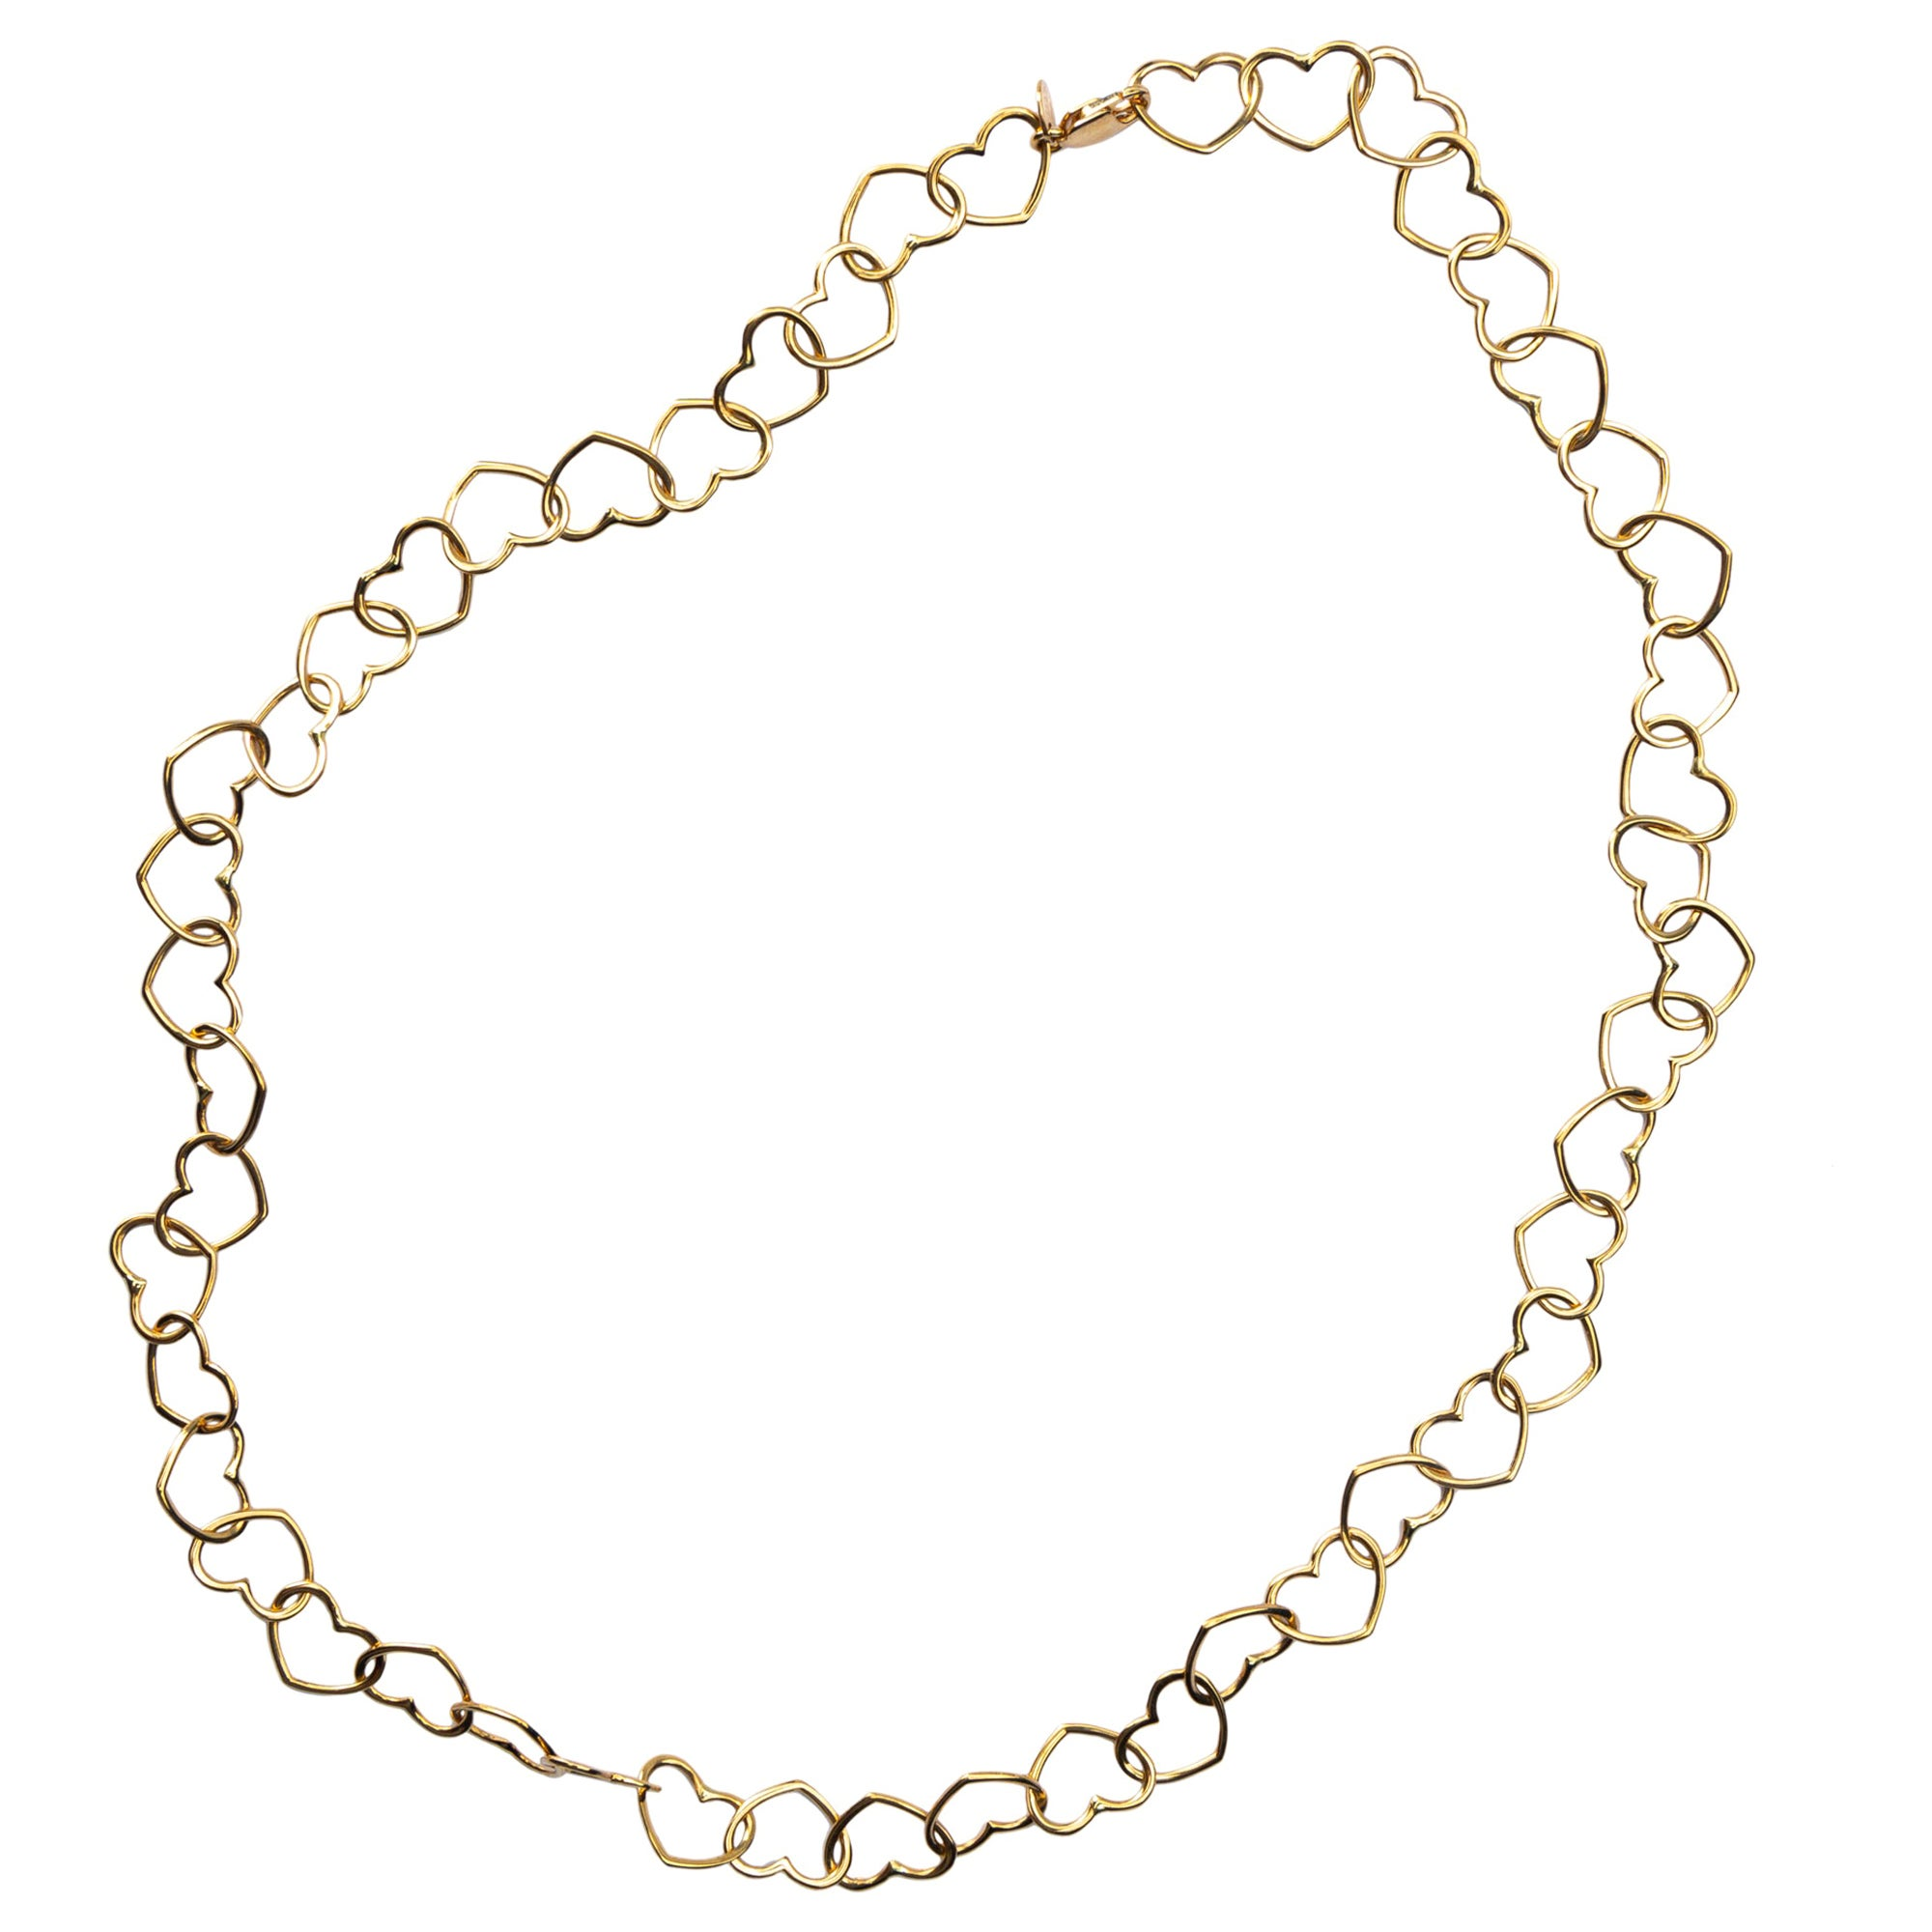 Jona 18 Karat Yellow Gold Multi Heart Link Chain Necklace